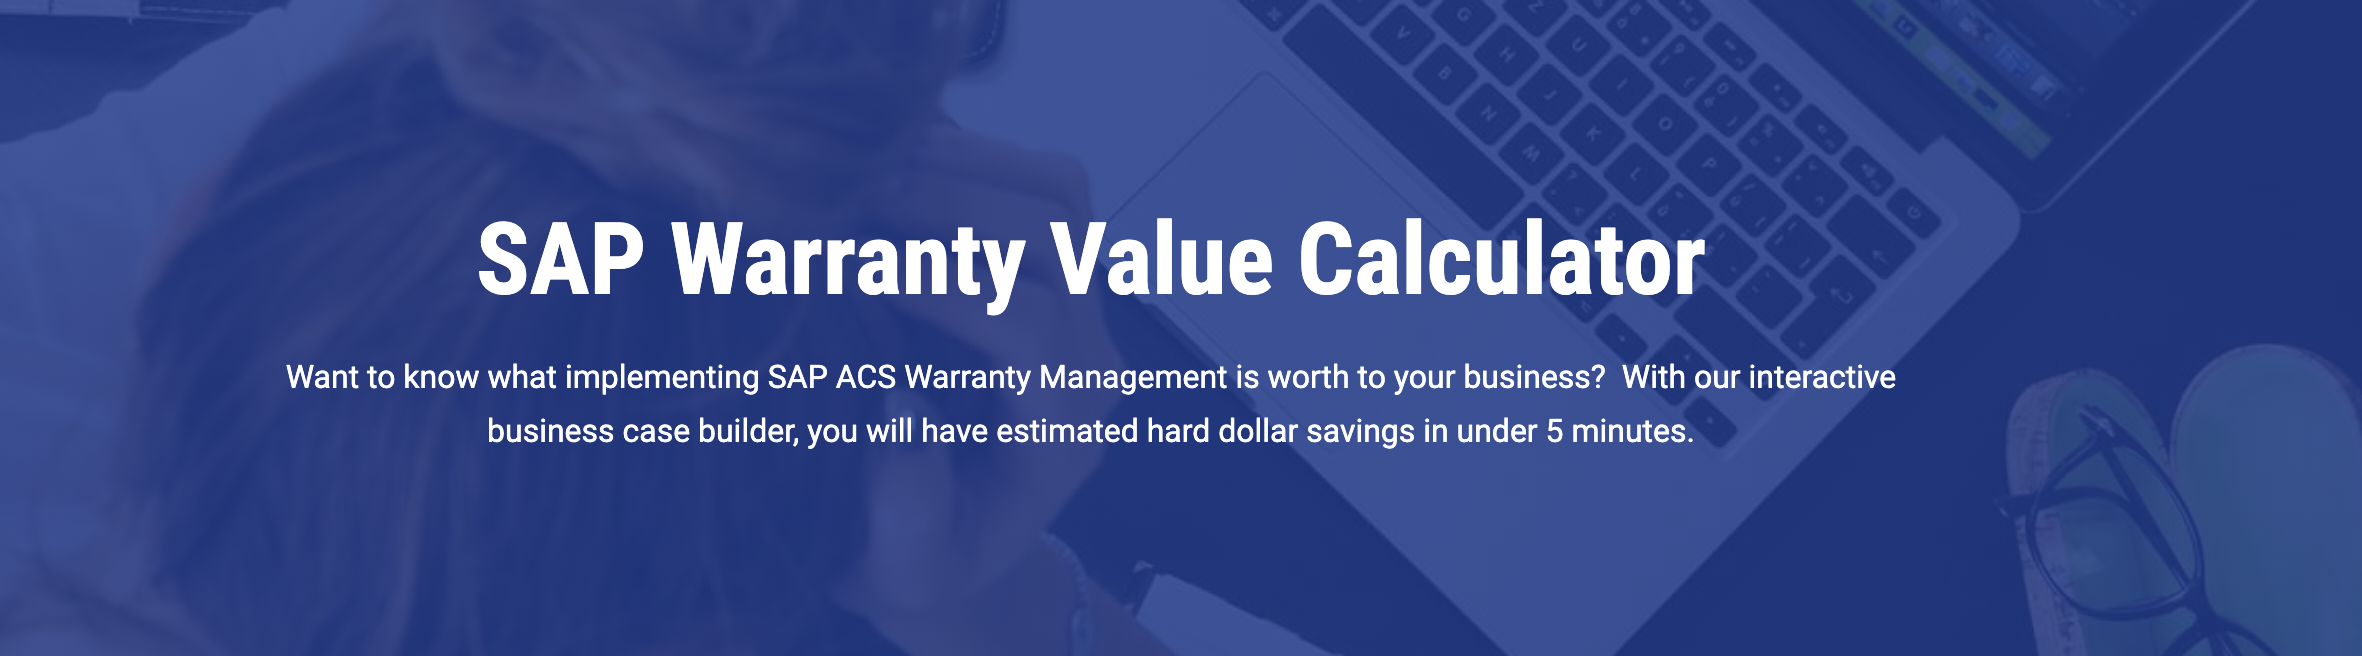 New Warranty Project Savings Calculator Image